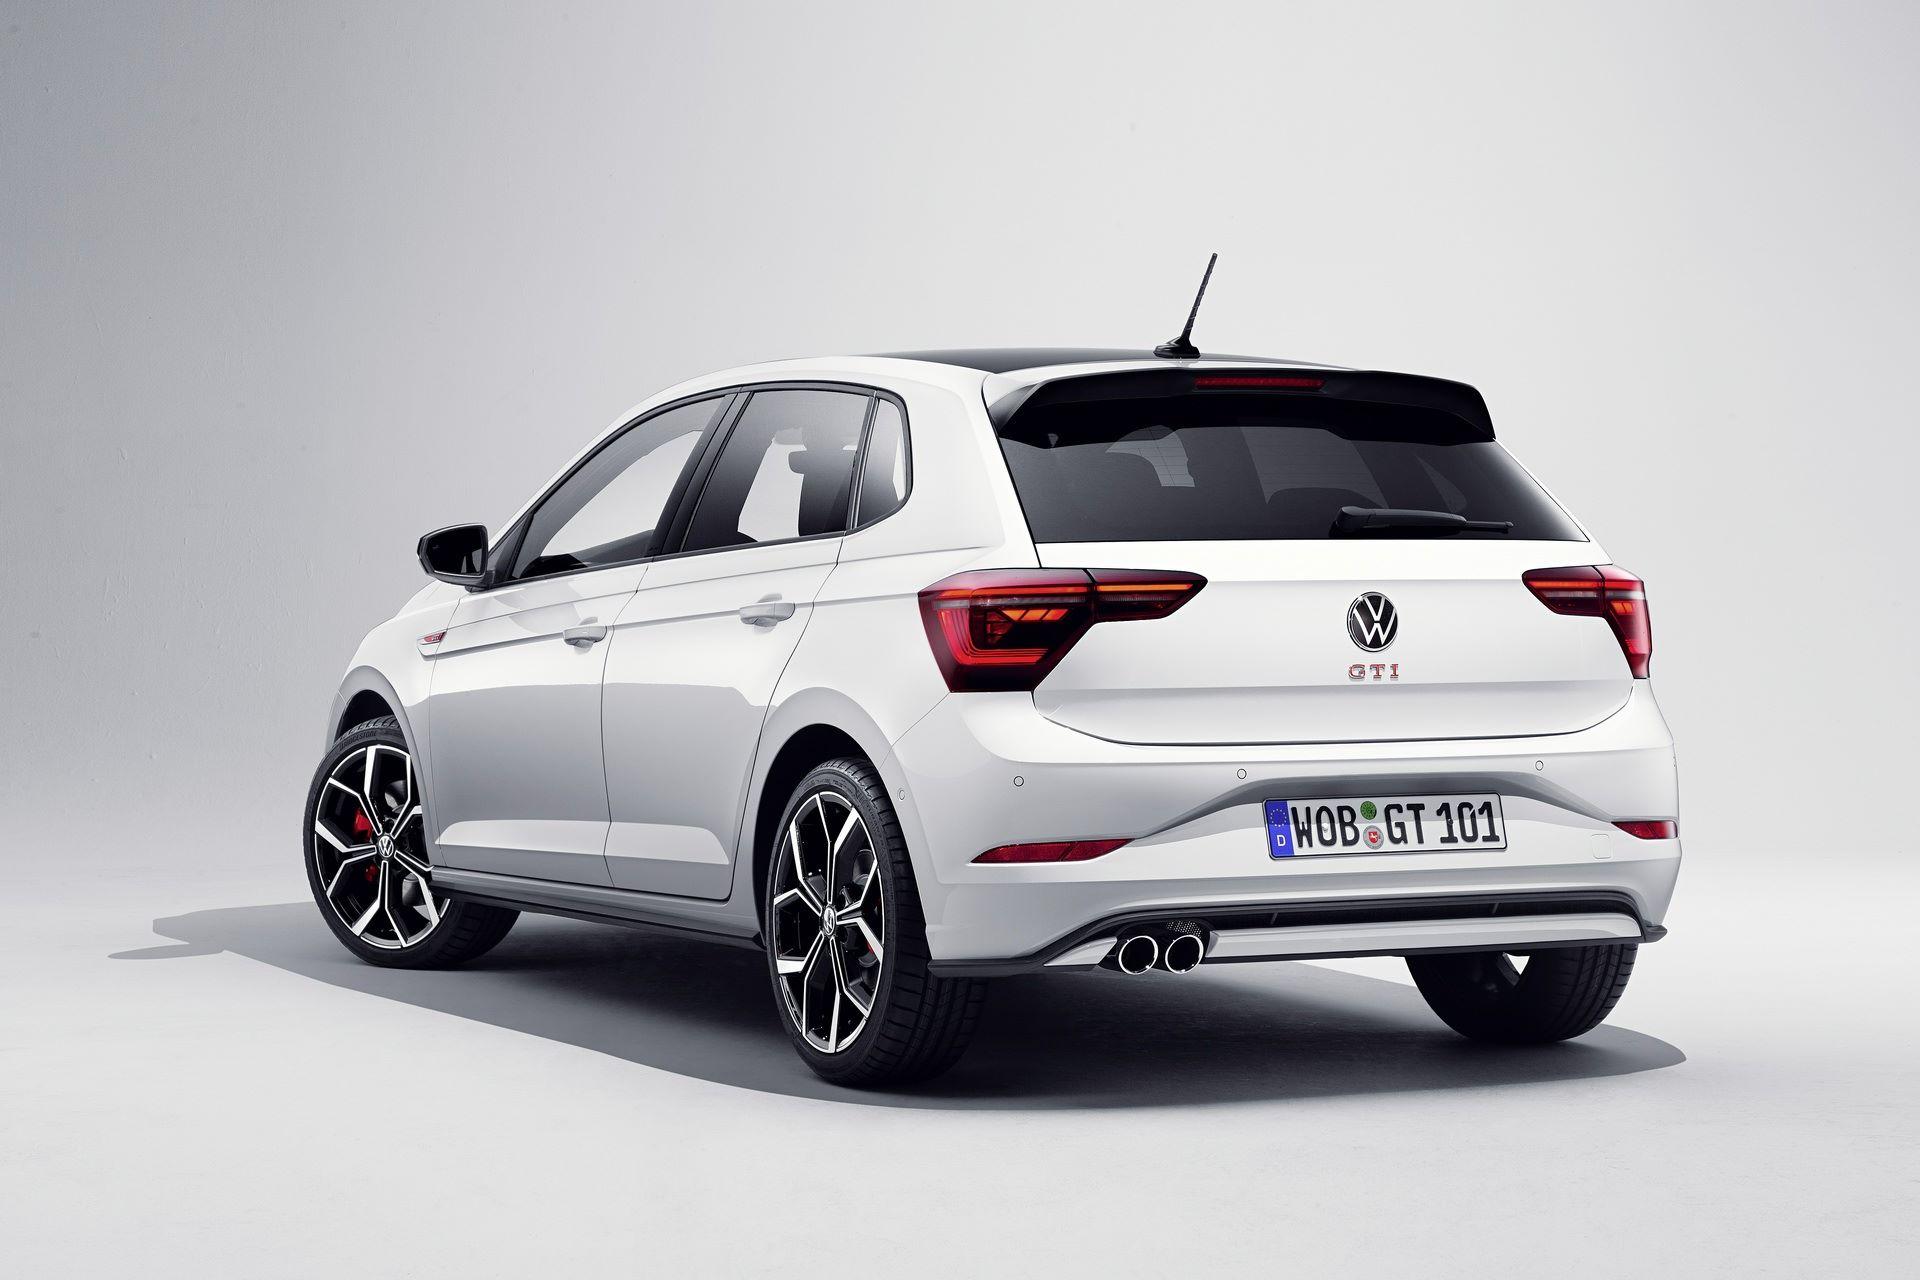 VW-Polo-GTI-facelift-3